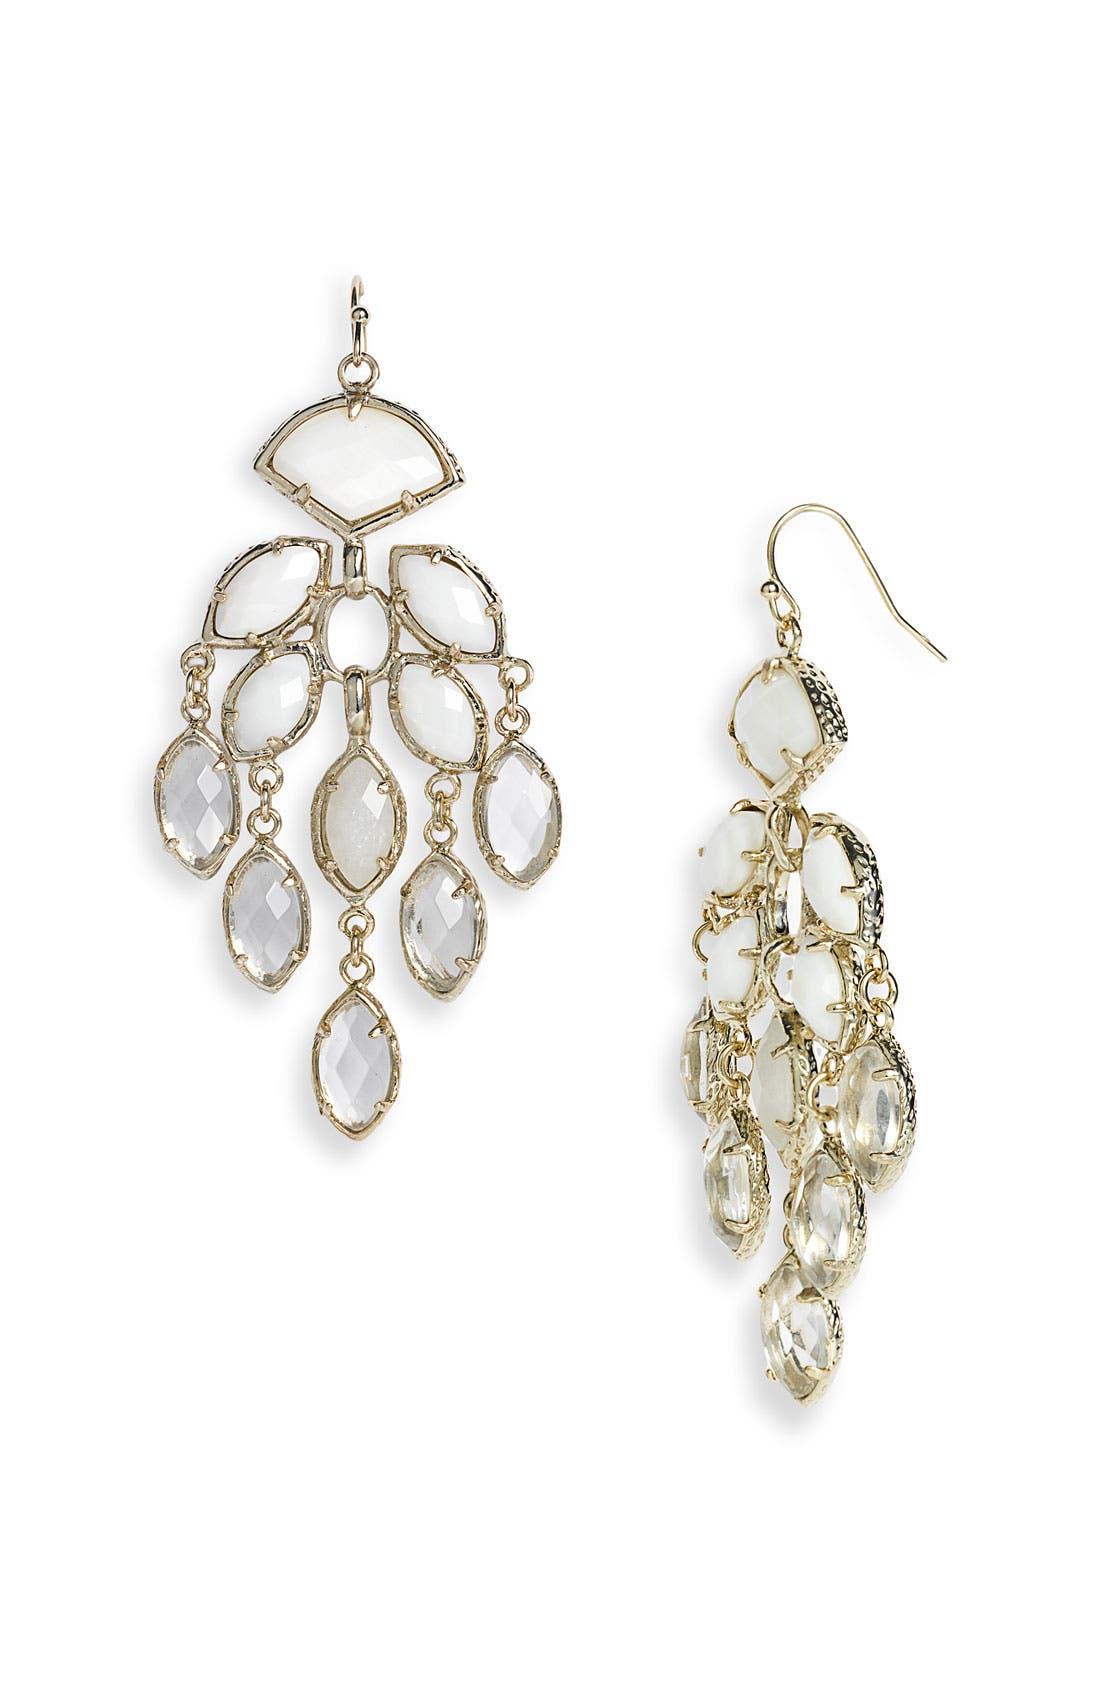 Alternate Image 1 Selected - Kendra Scott 'Gwen' Large Chandelier Earrings